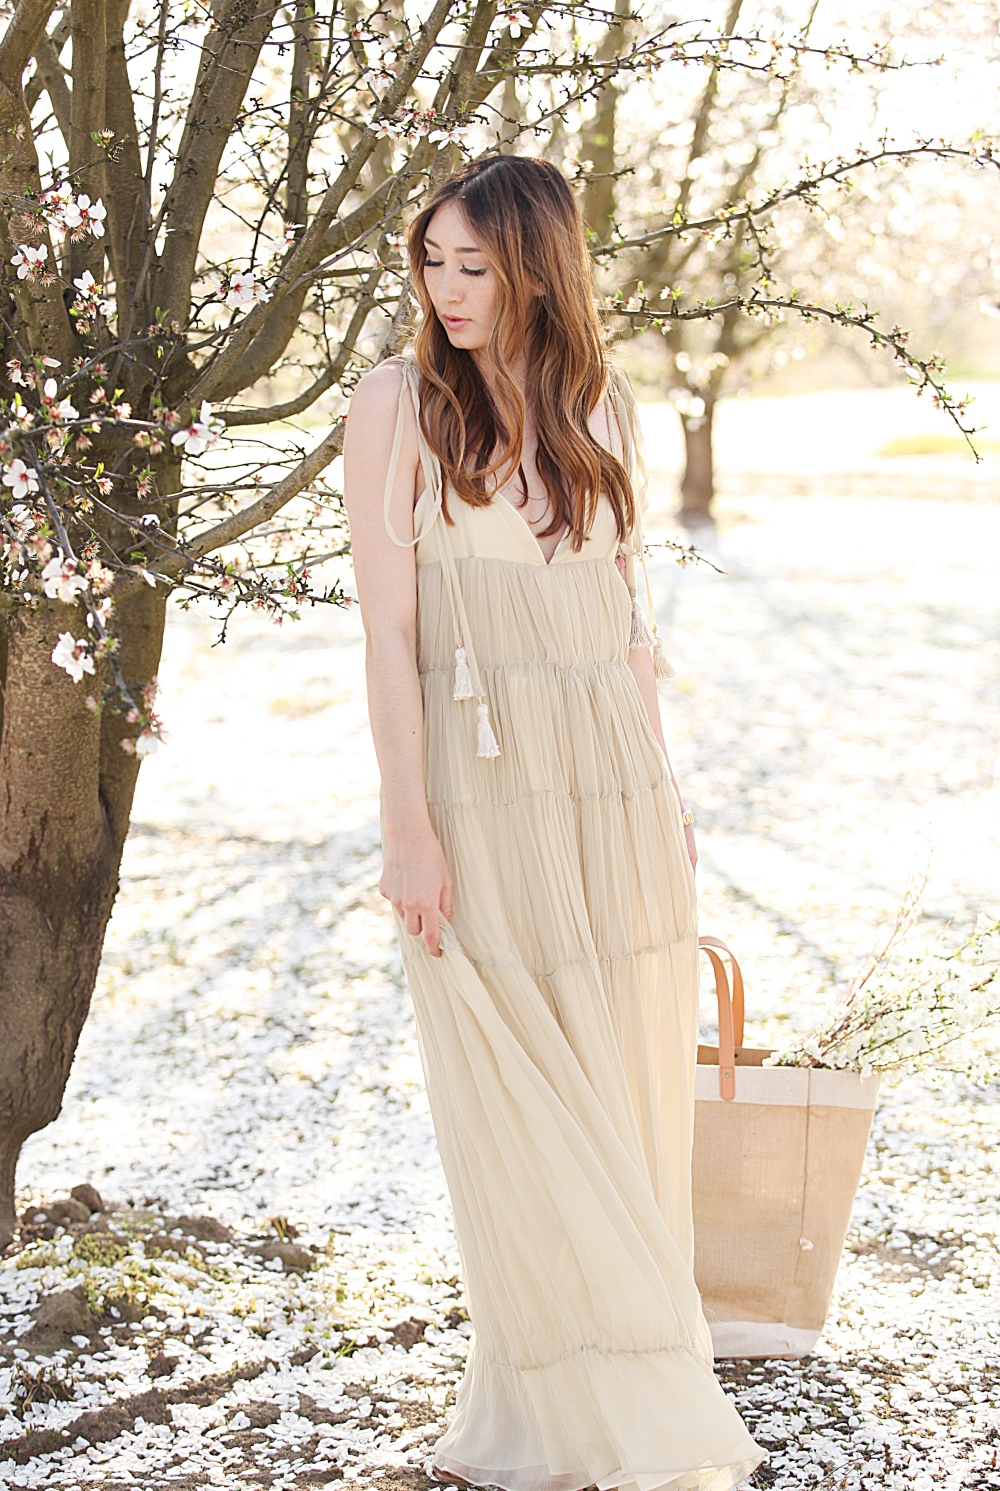 Heavenly Creature Alyssa Nicole Silk Gown 2